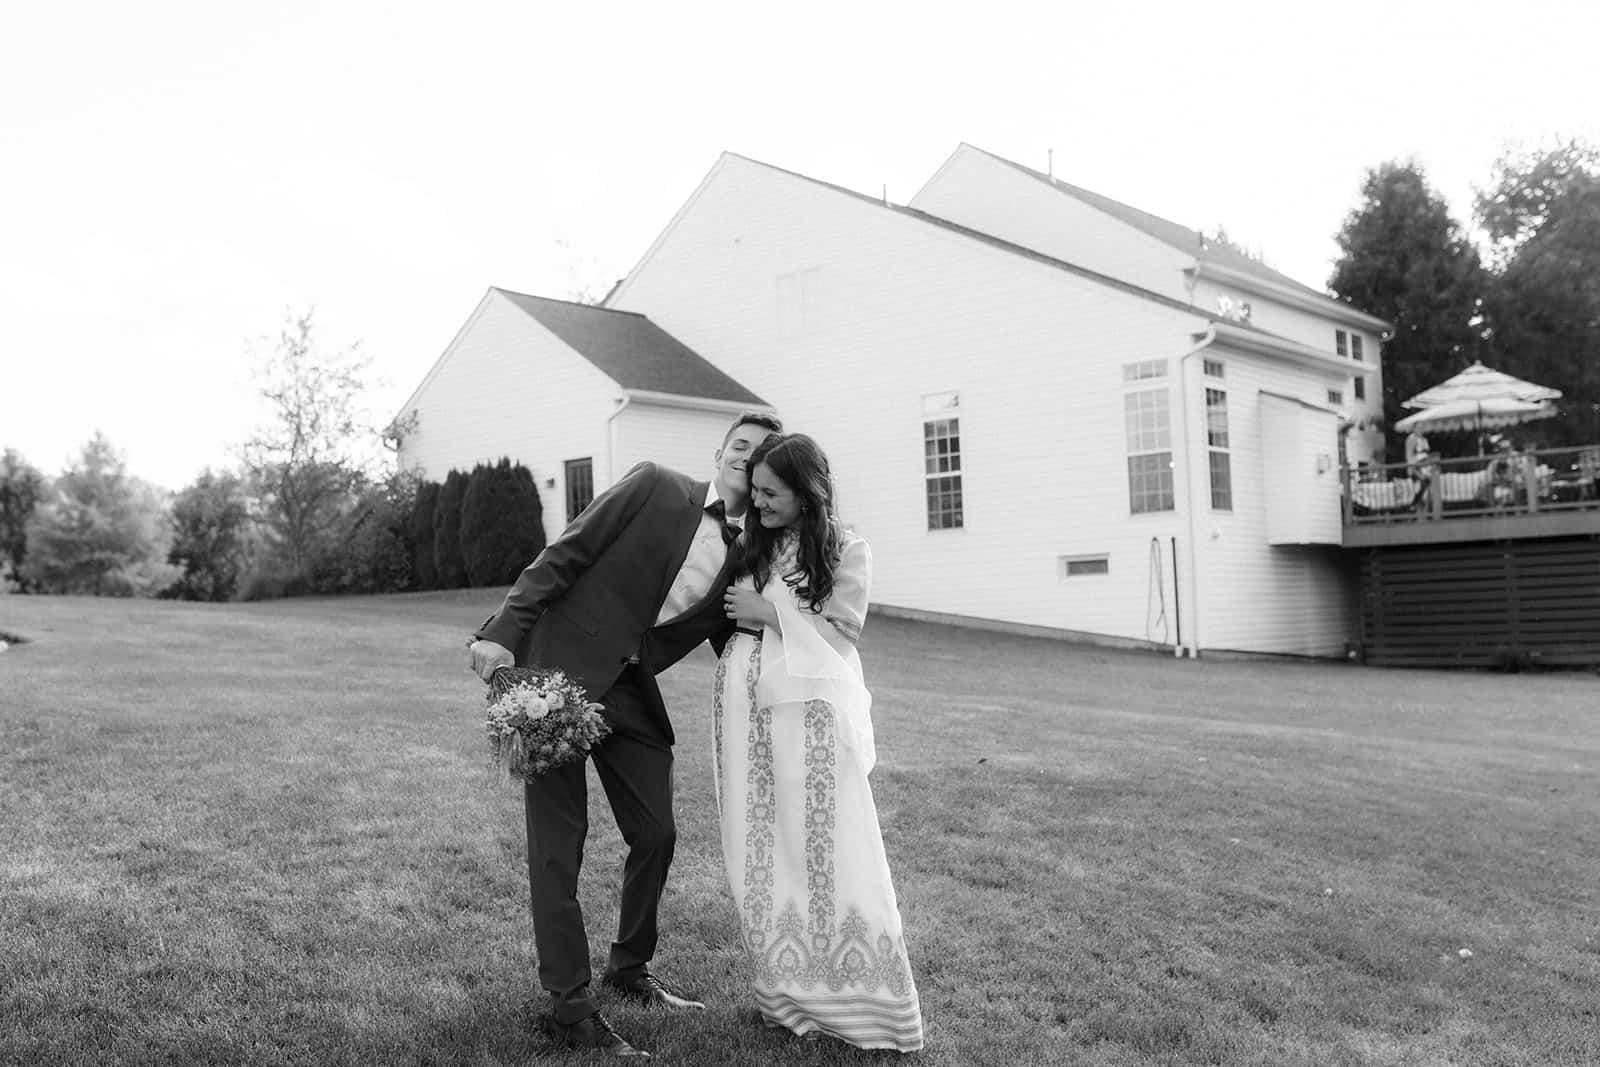 COVID-19 Backyard Wedding - WILLIAM + KAYLA 256